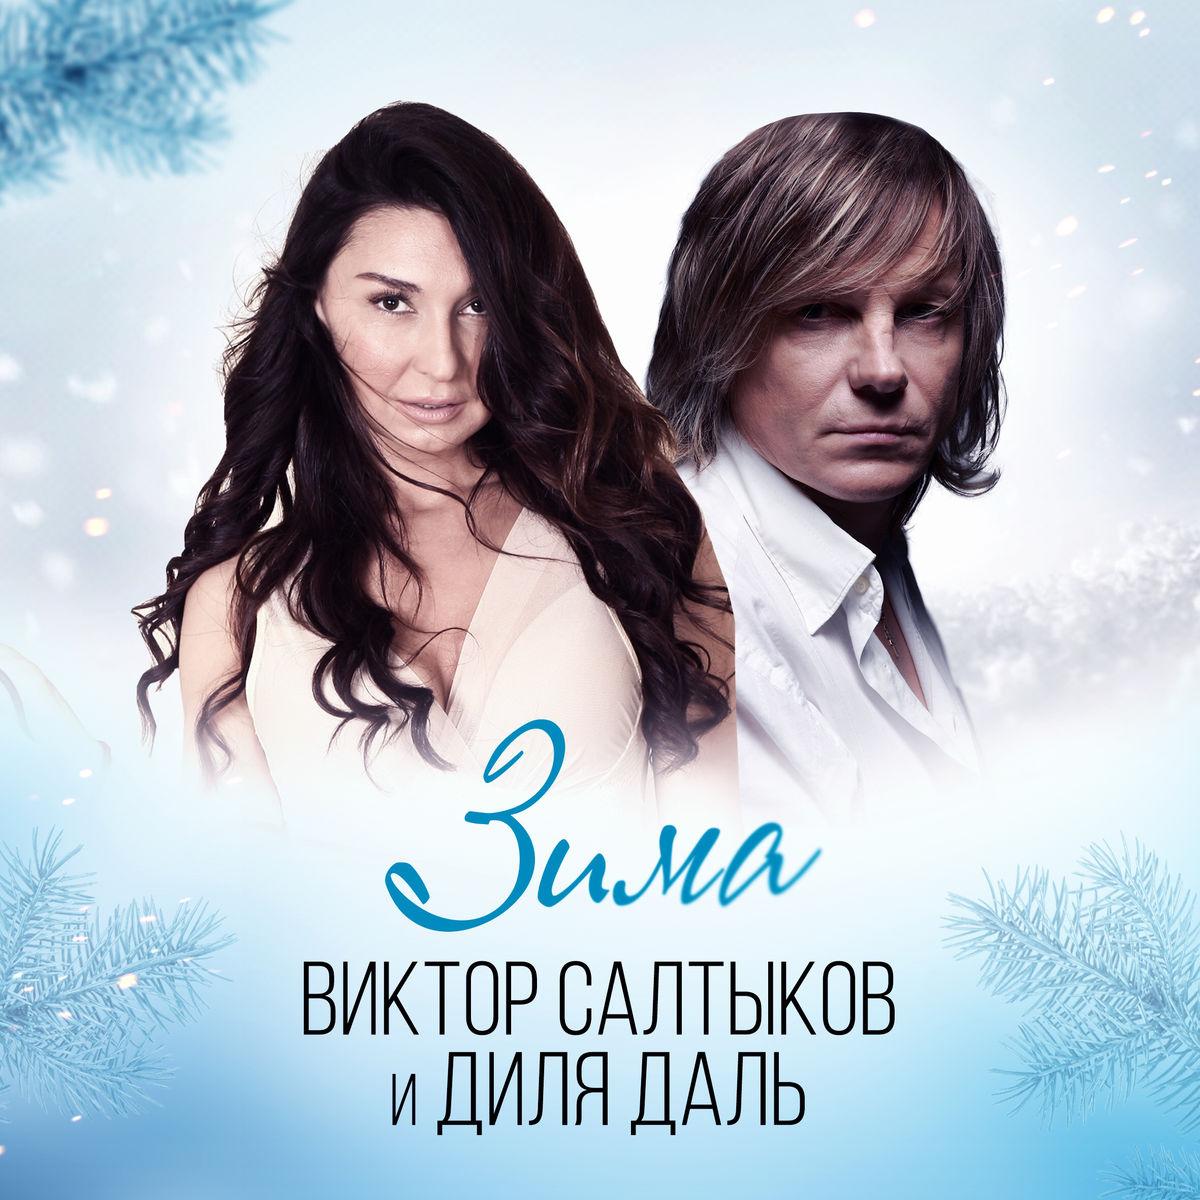 Скачать песни зима 2018 новинки